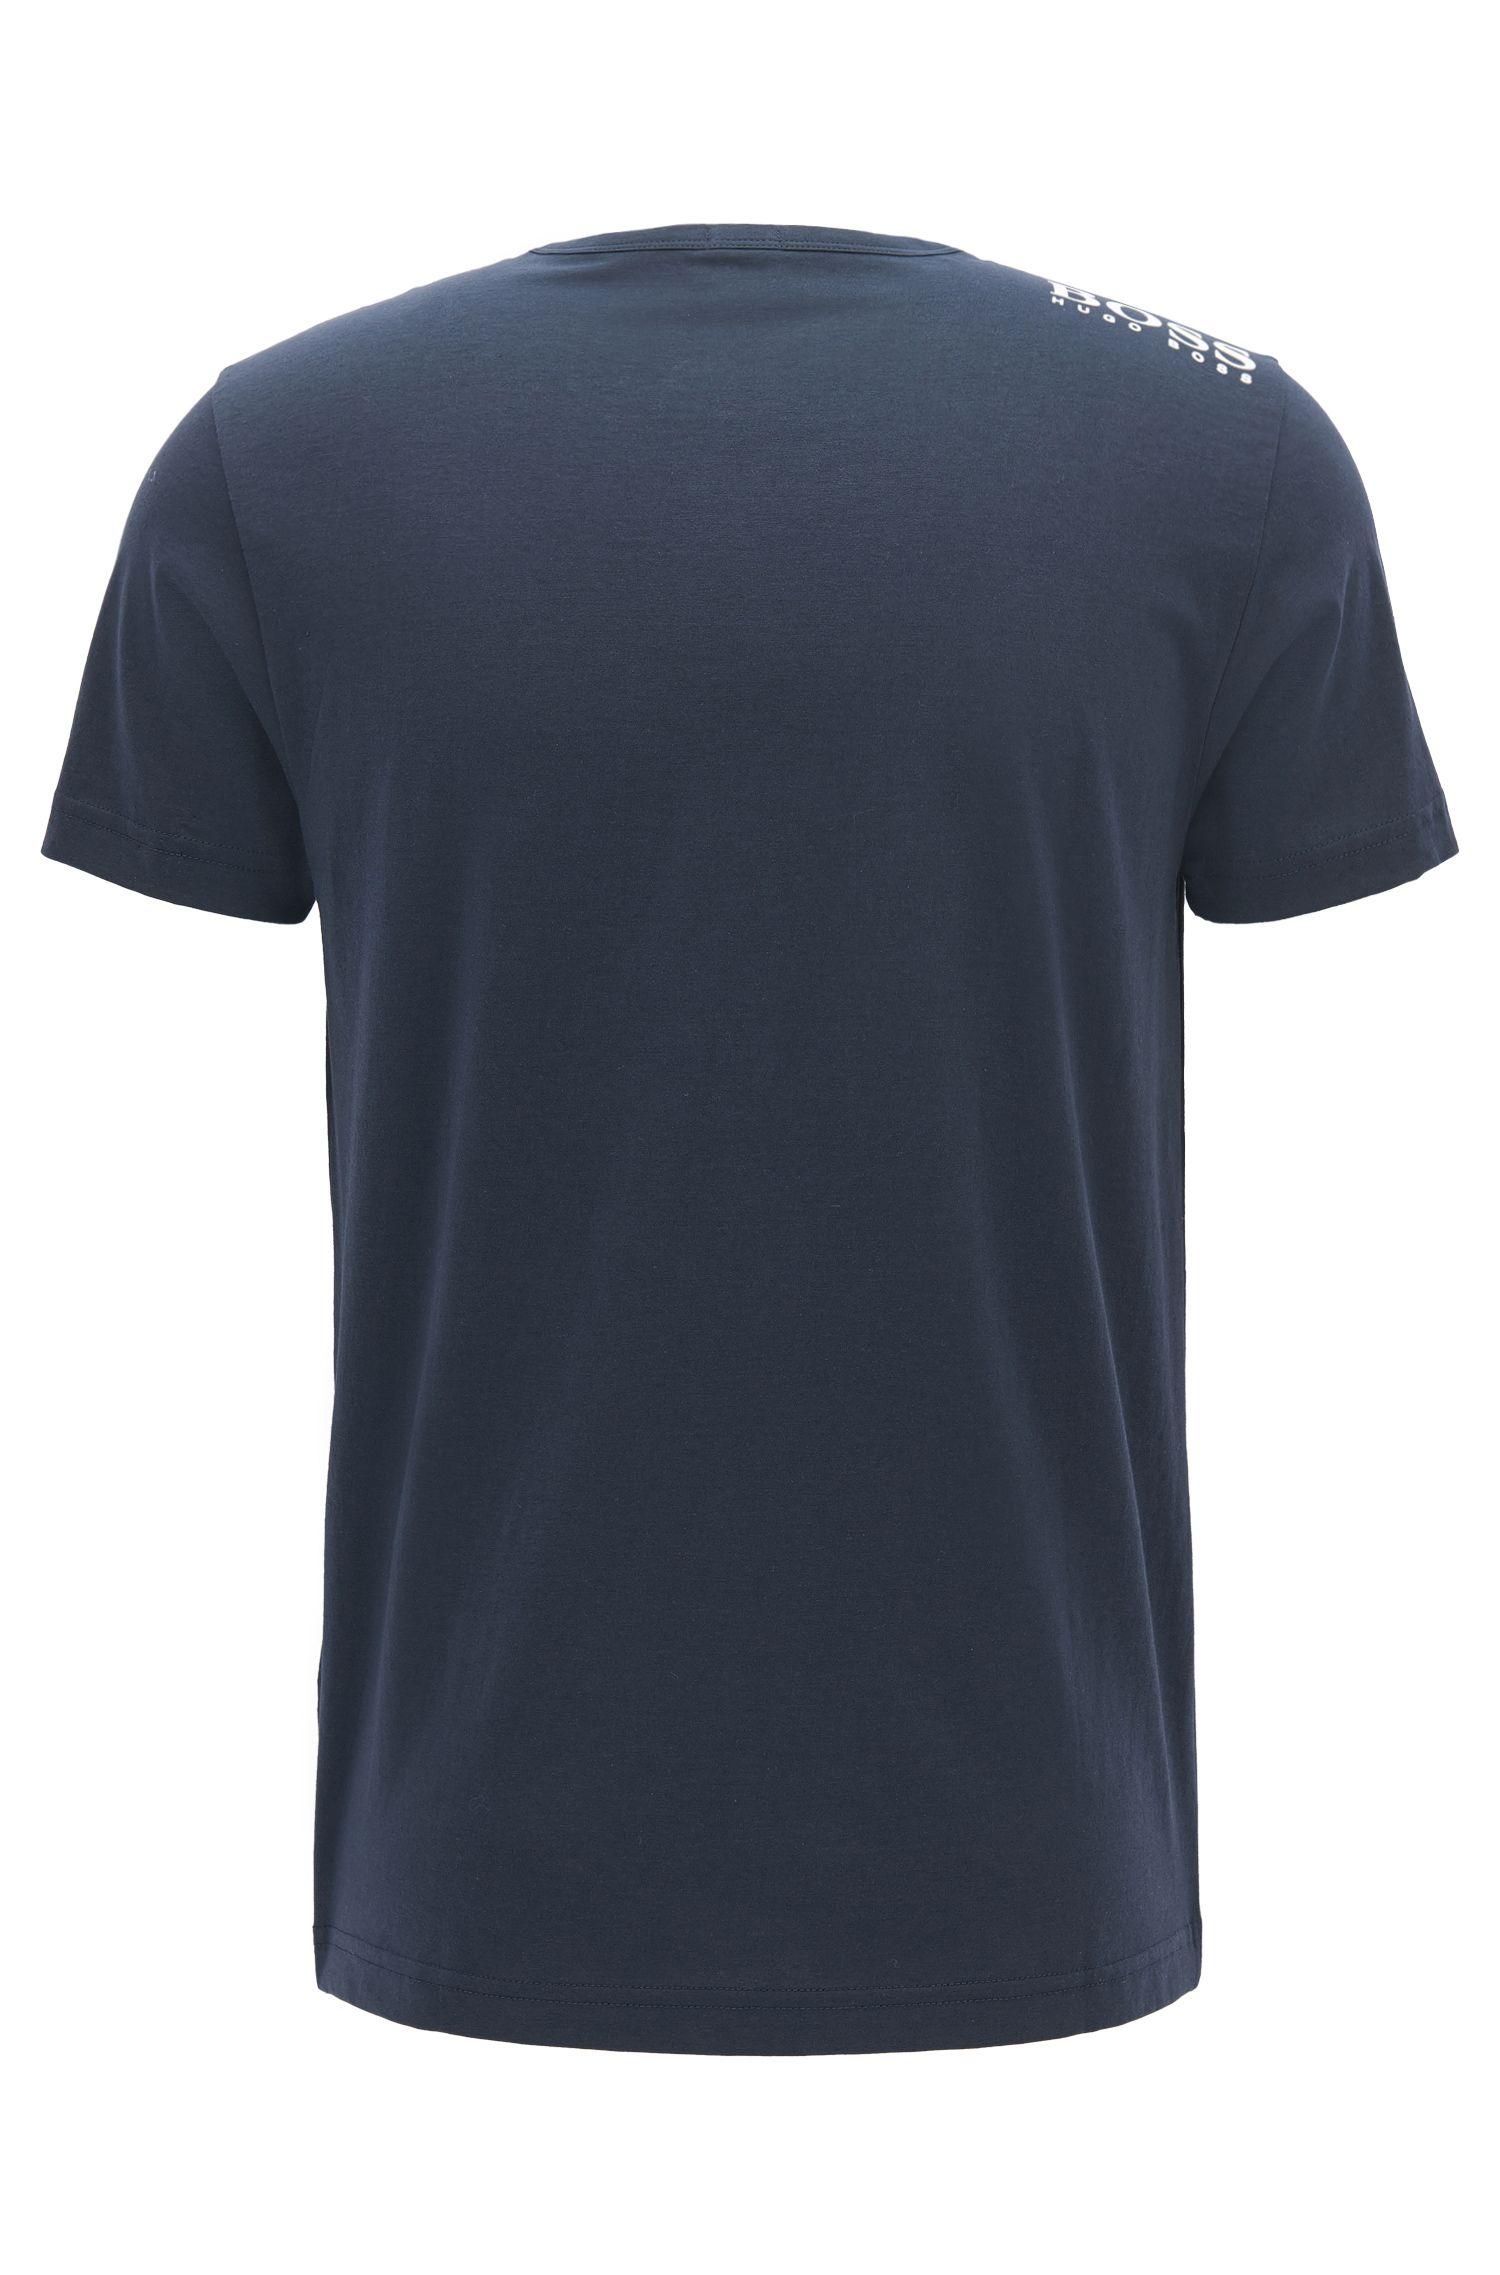 T-Shirt aus softer Baumwolle mit V-Ausschnitt